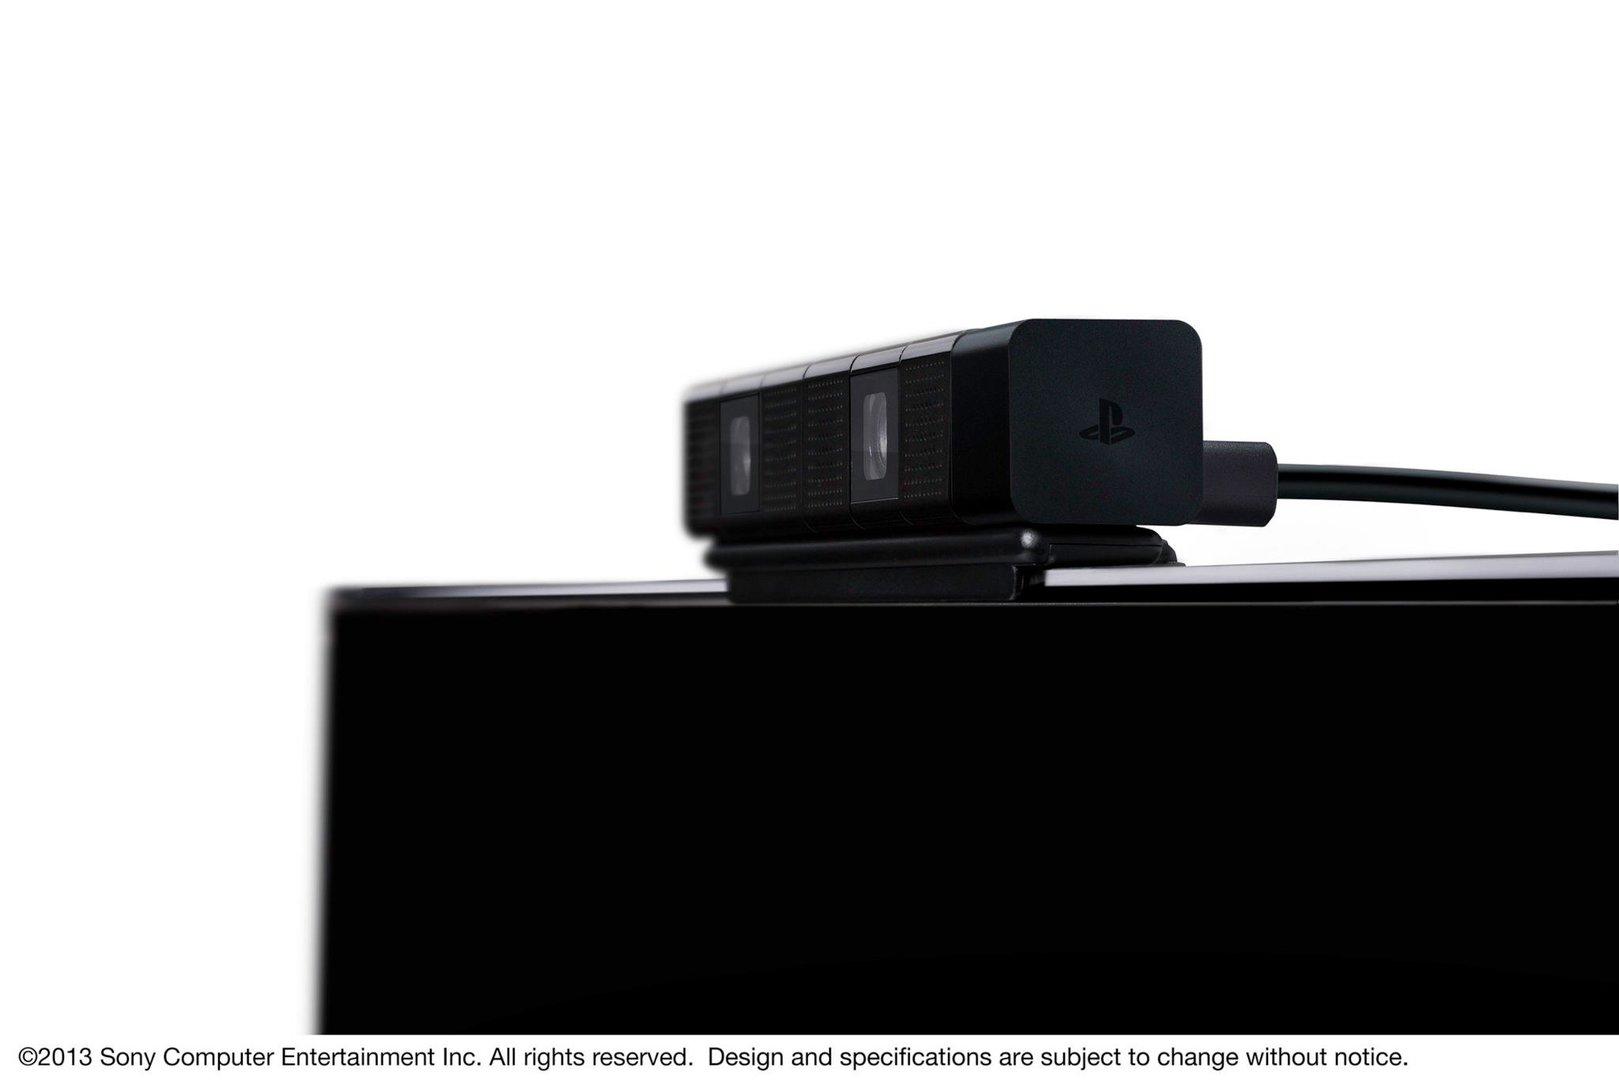 Sony DualShock 4